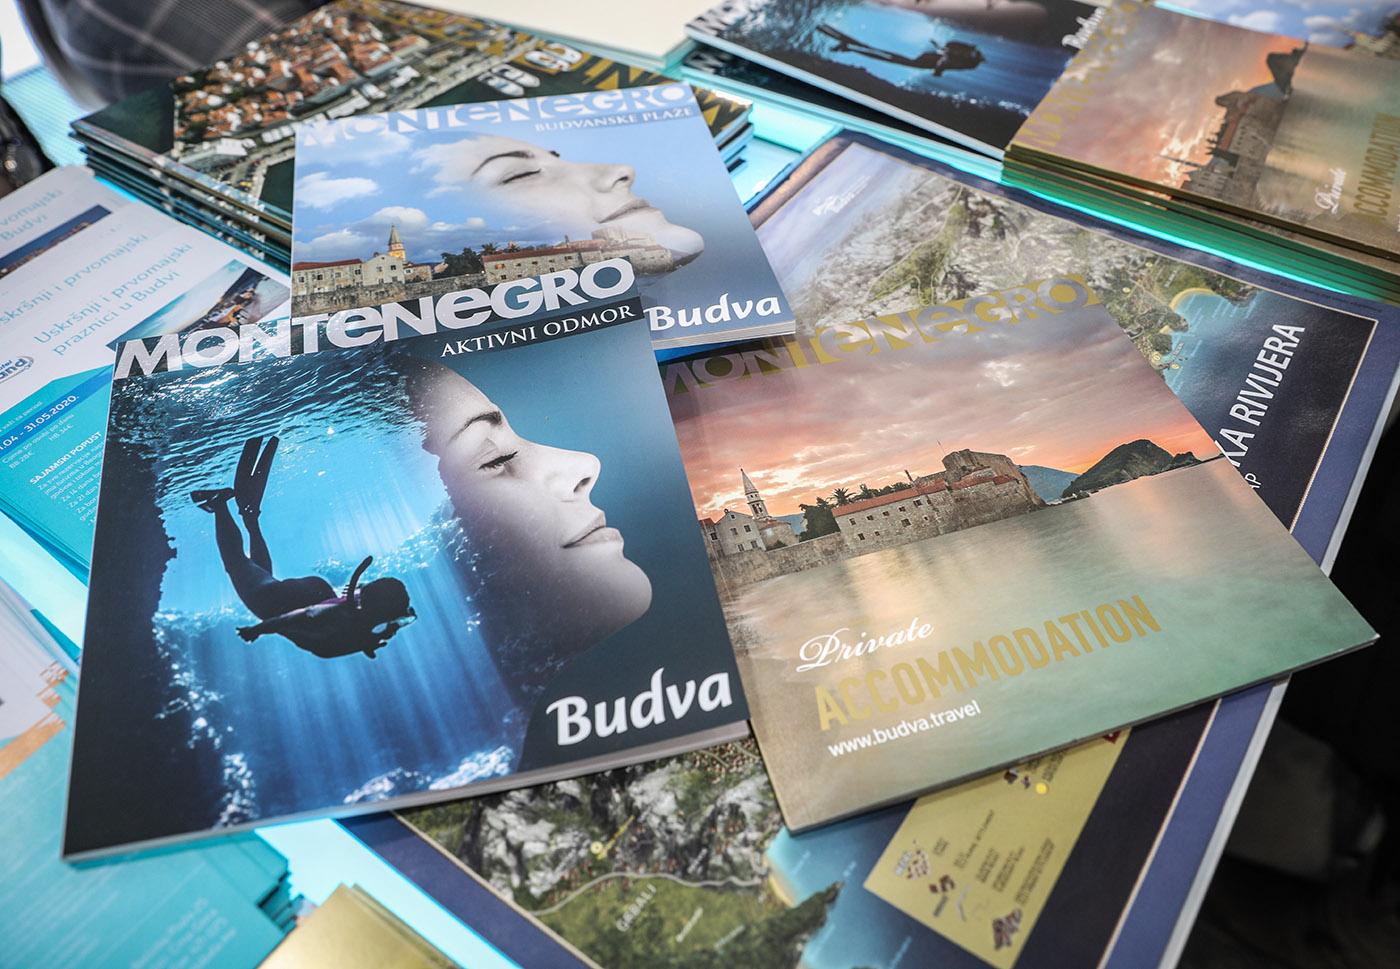 budva-sea budva-activities montenegro budva-yacht budva